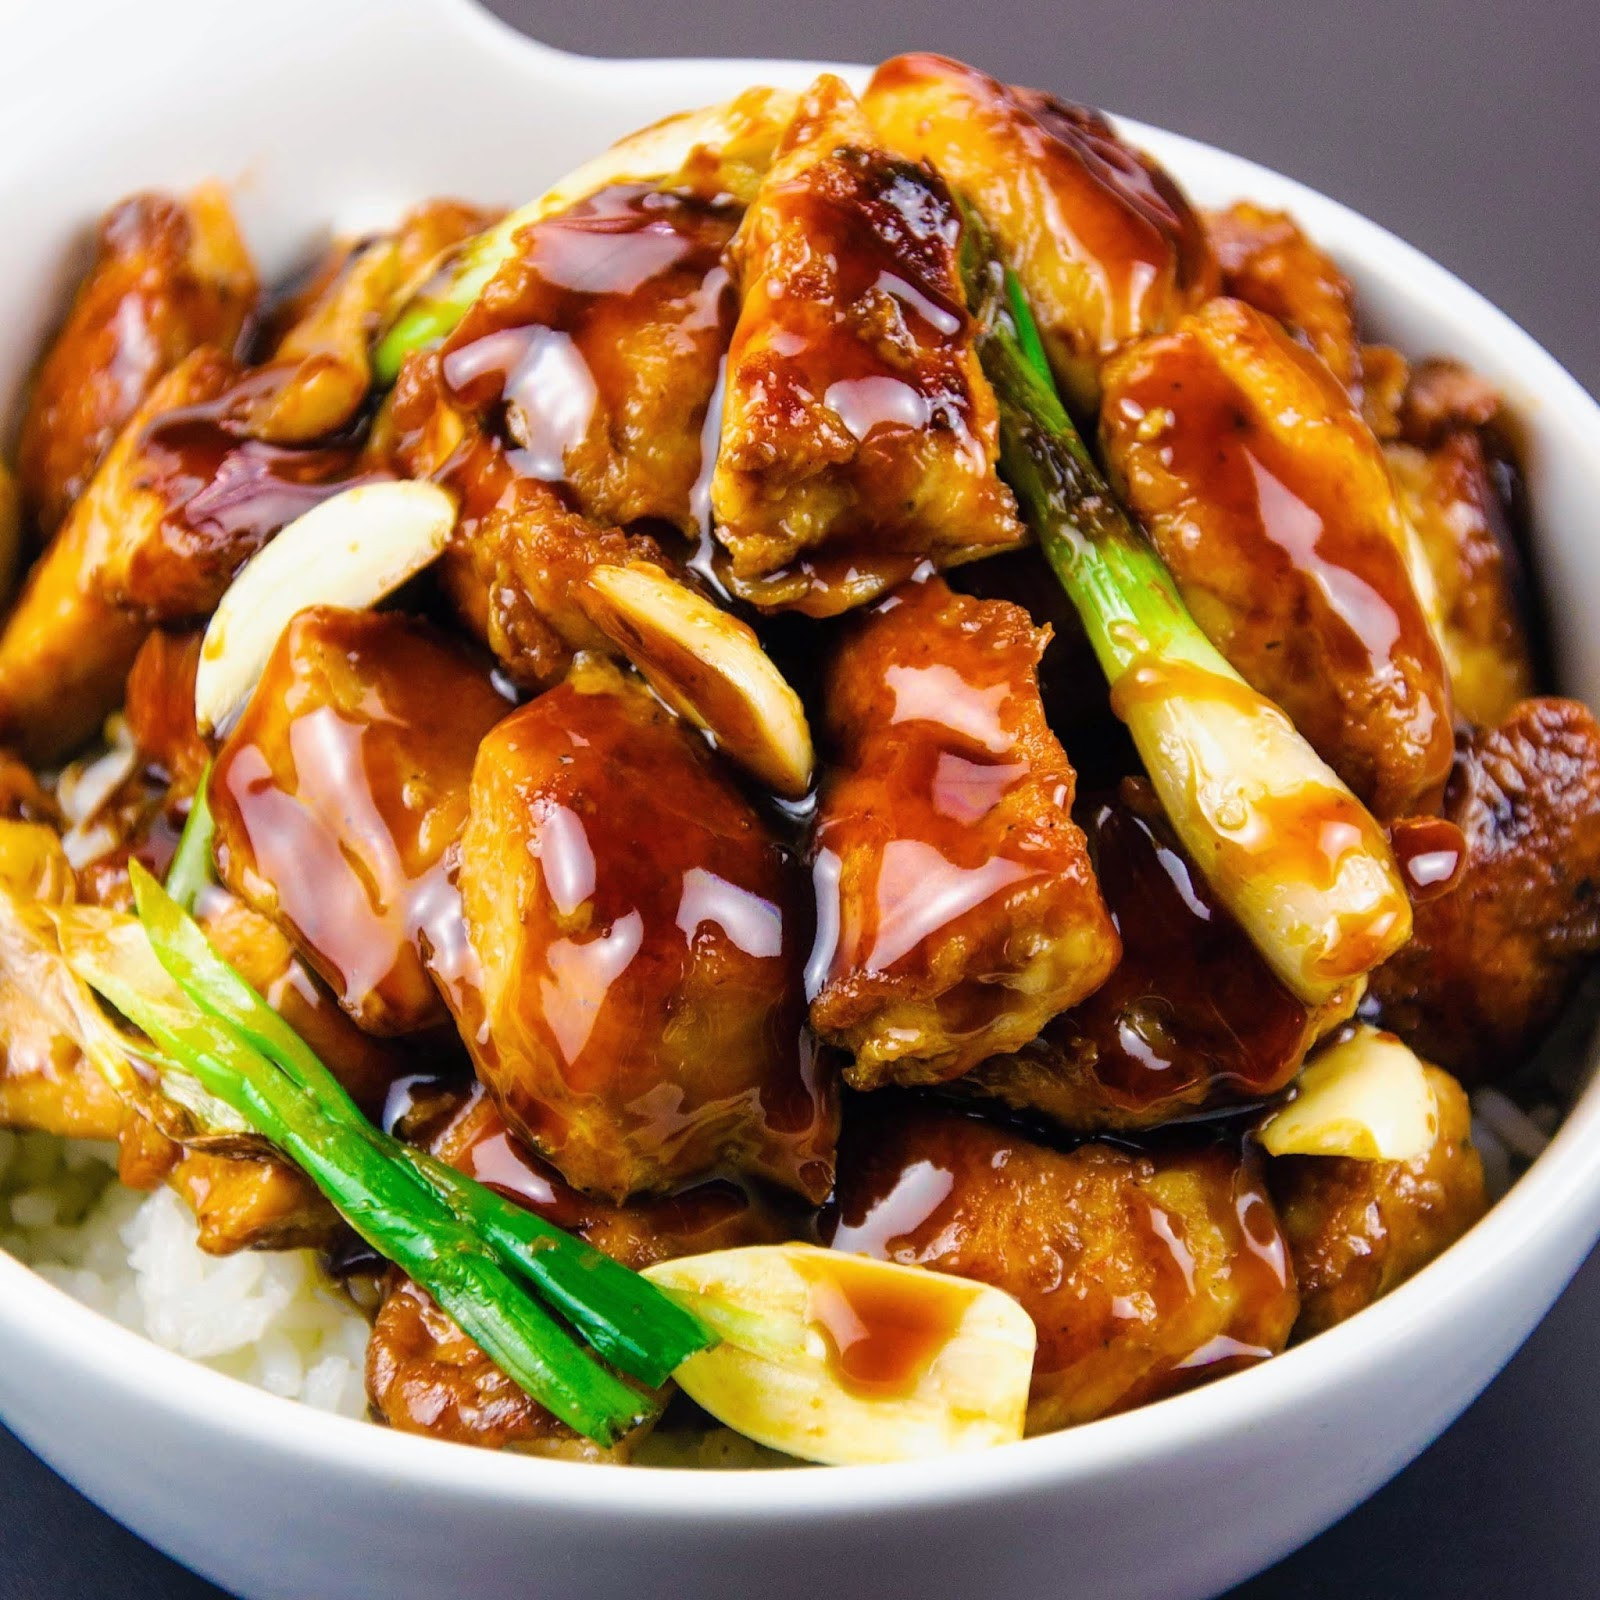 Dinner Recipe For Diabetic  Diabetic Recipes for Dinner – Diabetic Dinner Recipes